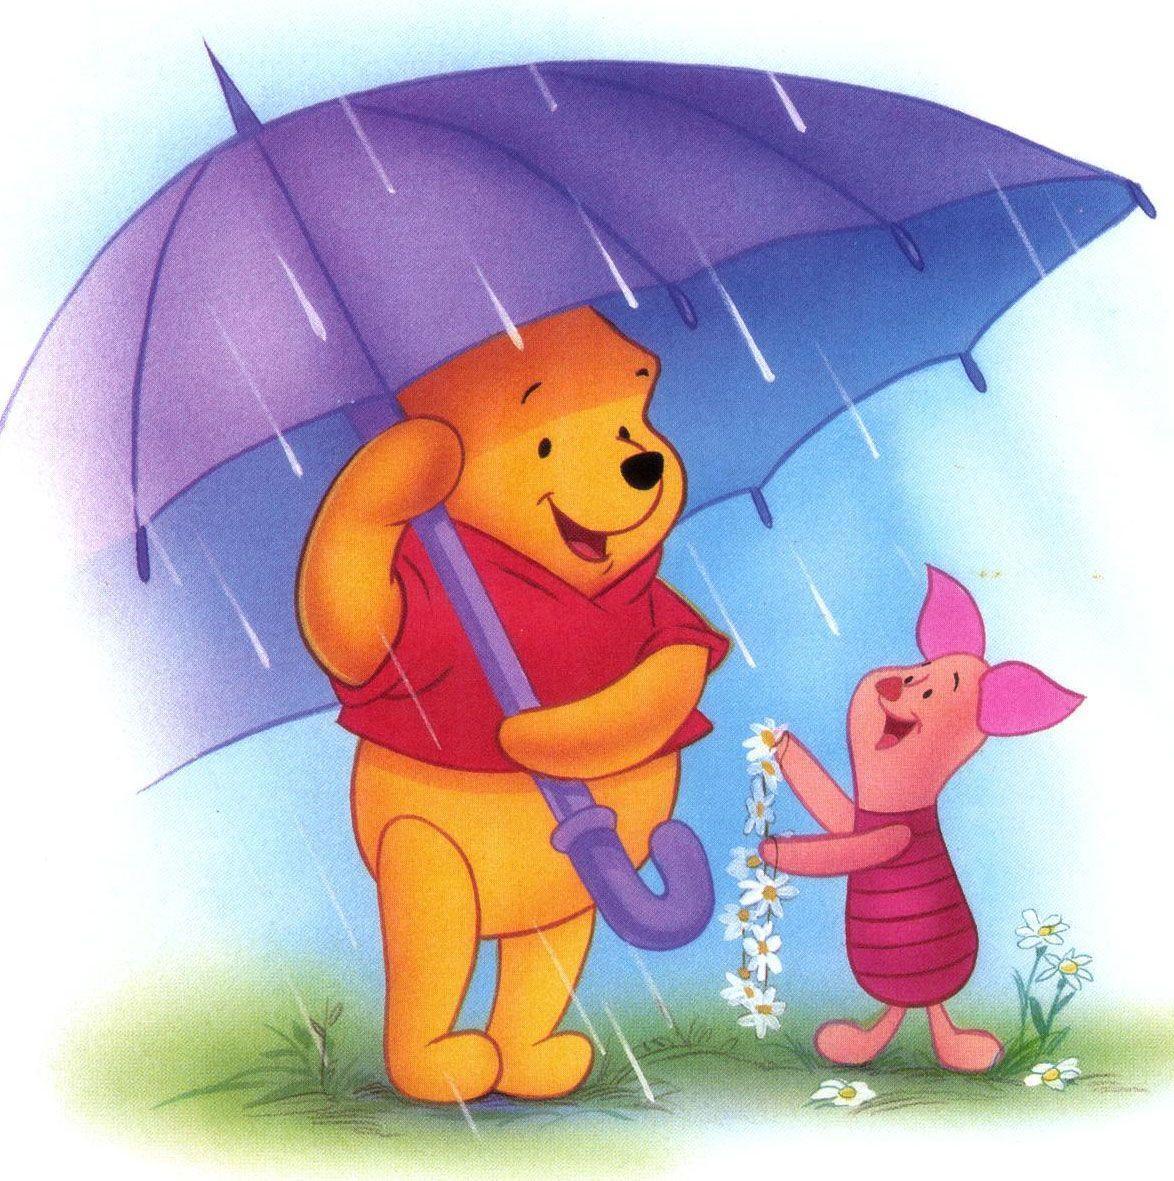 Winnie The Pooh Rain: Pooh Bear Wallpapers